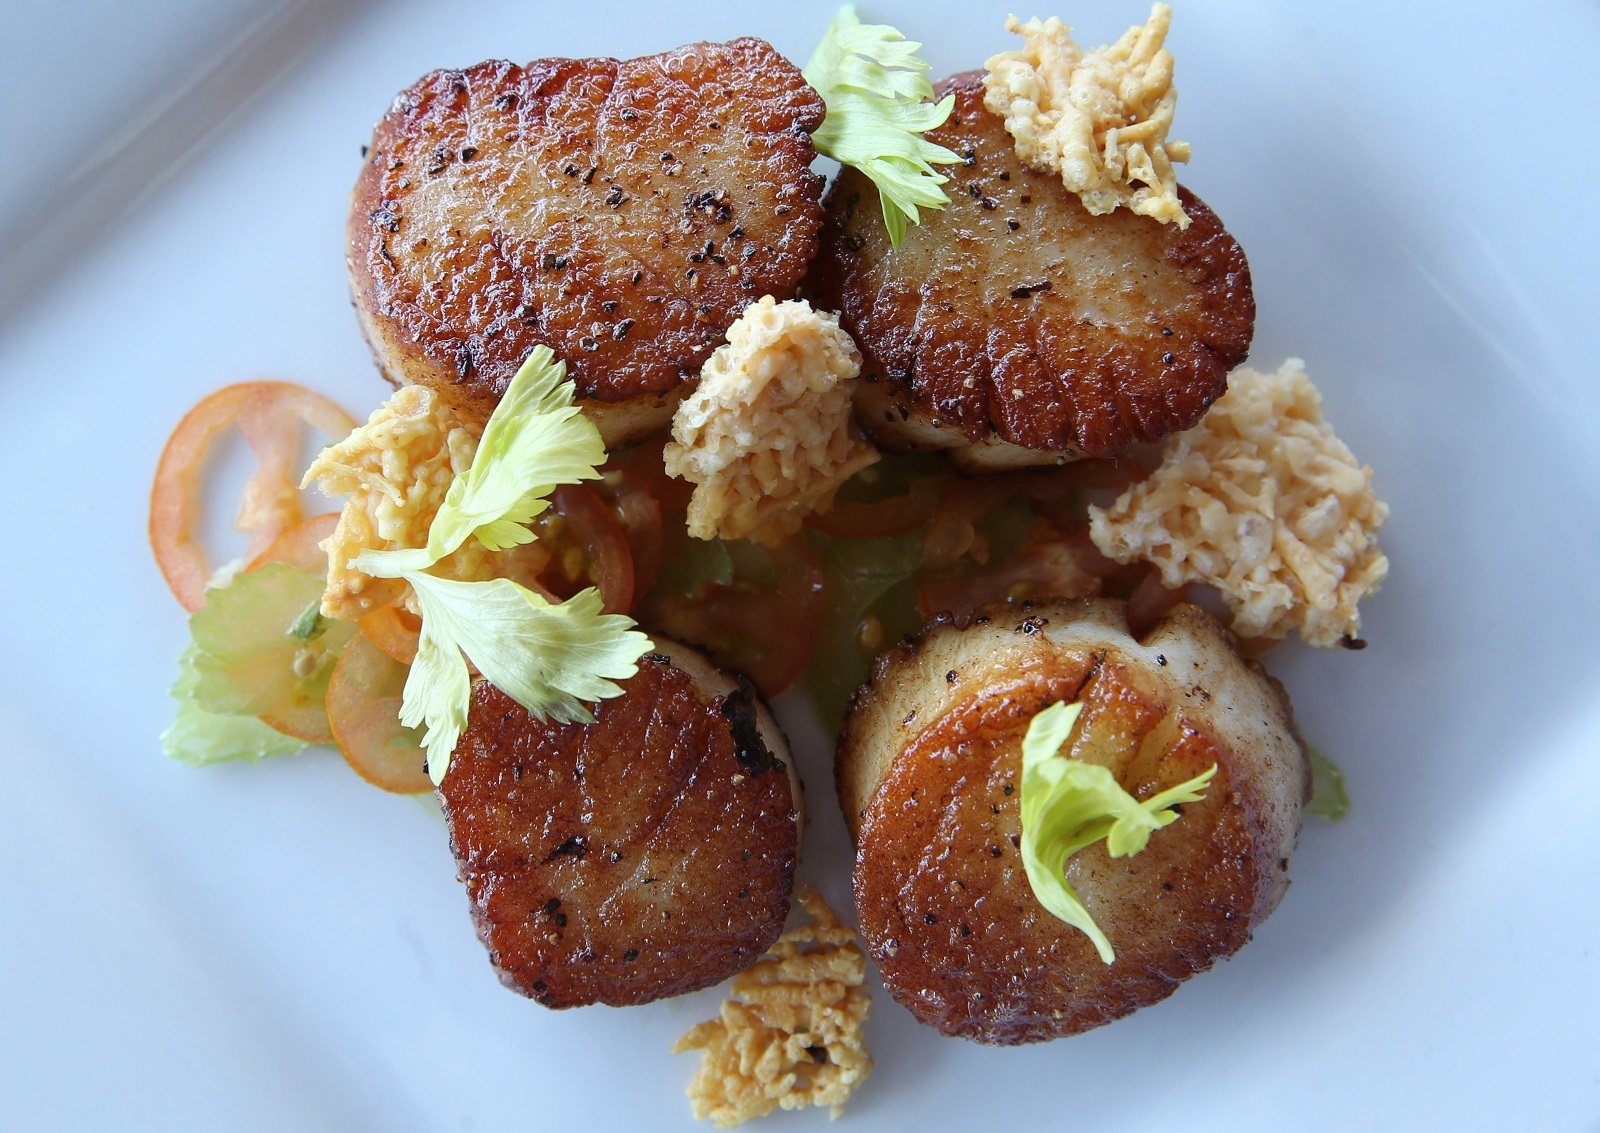 Seared sea scallops are with tomato and celery salad, parmesan crisps and lemon oil. (Sharon Cantillon/Buffalo News)